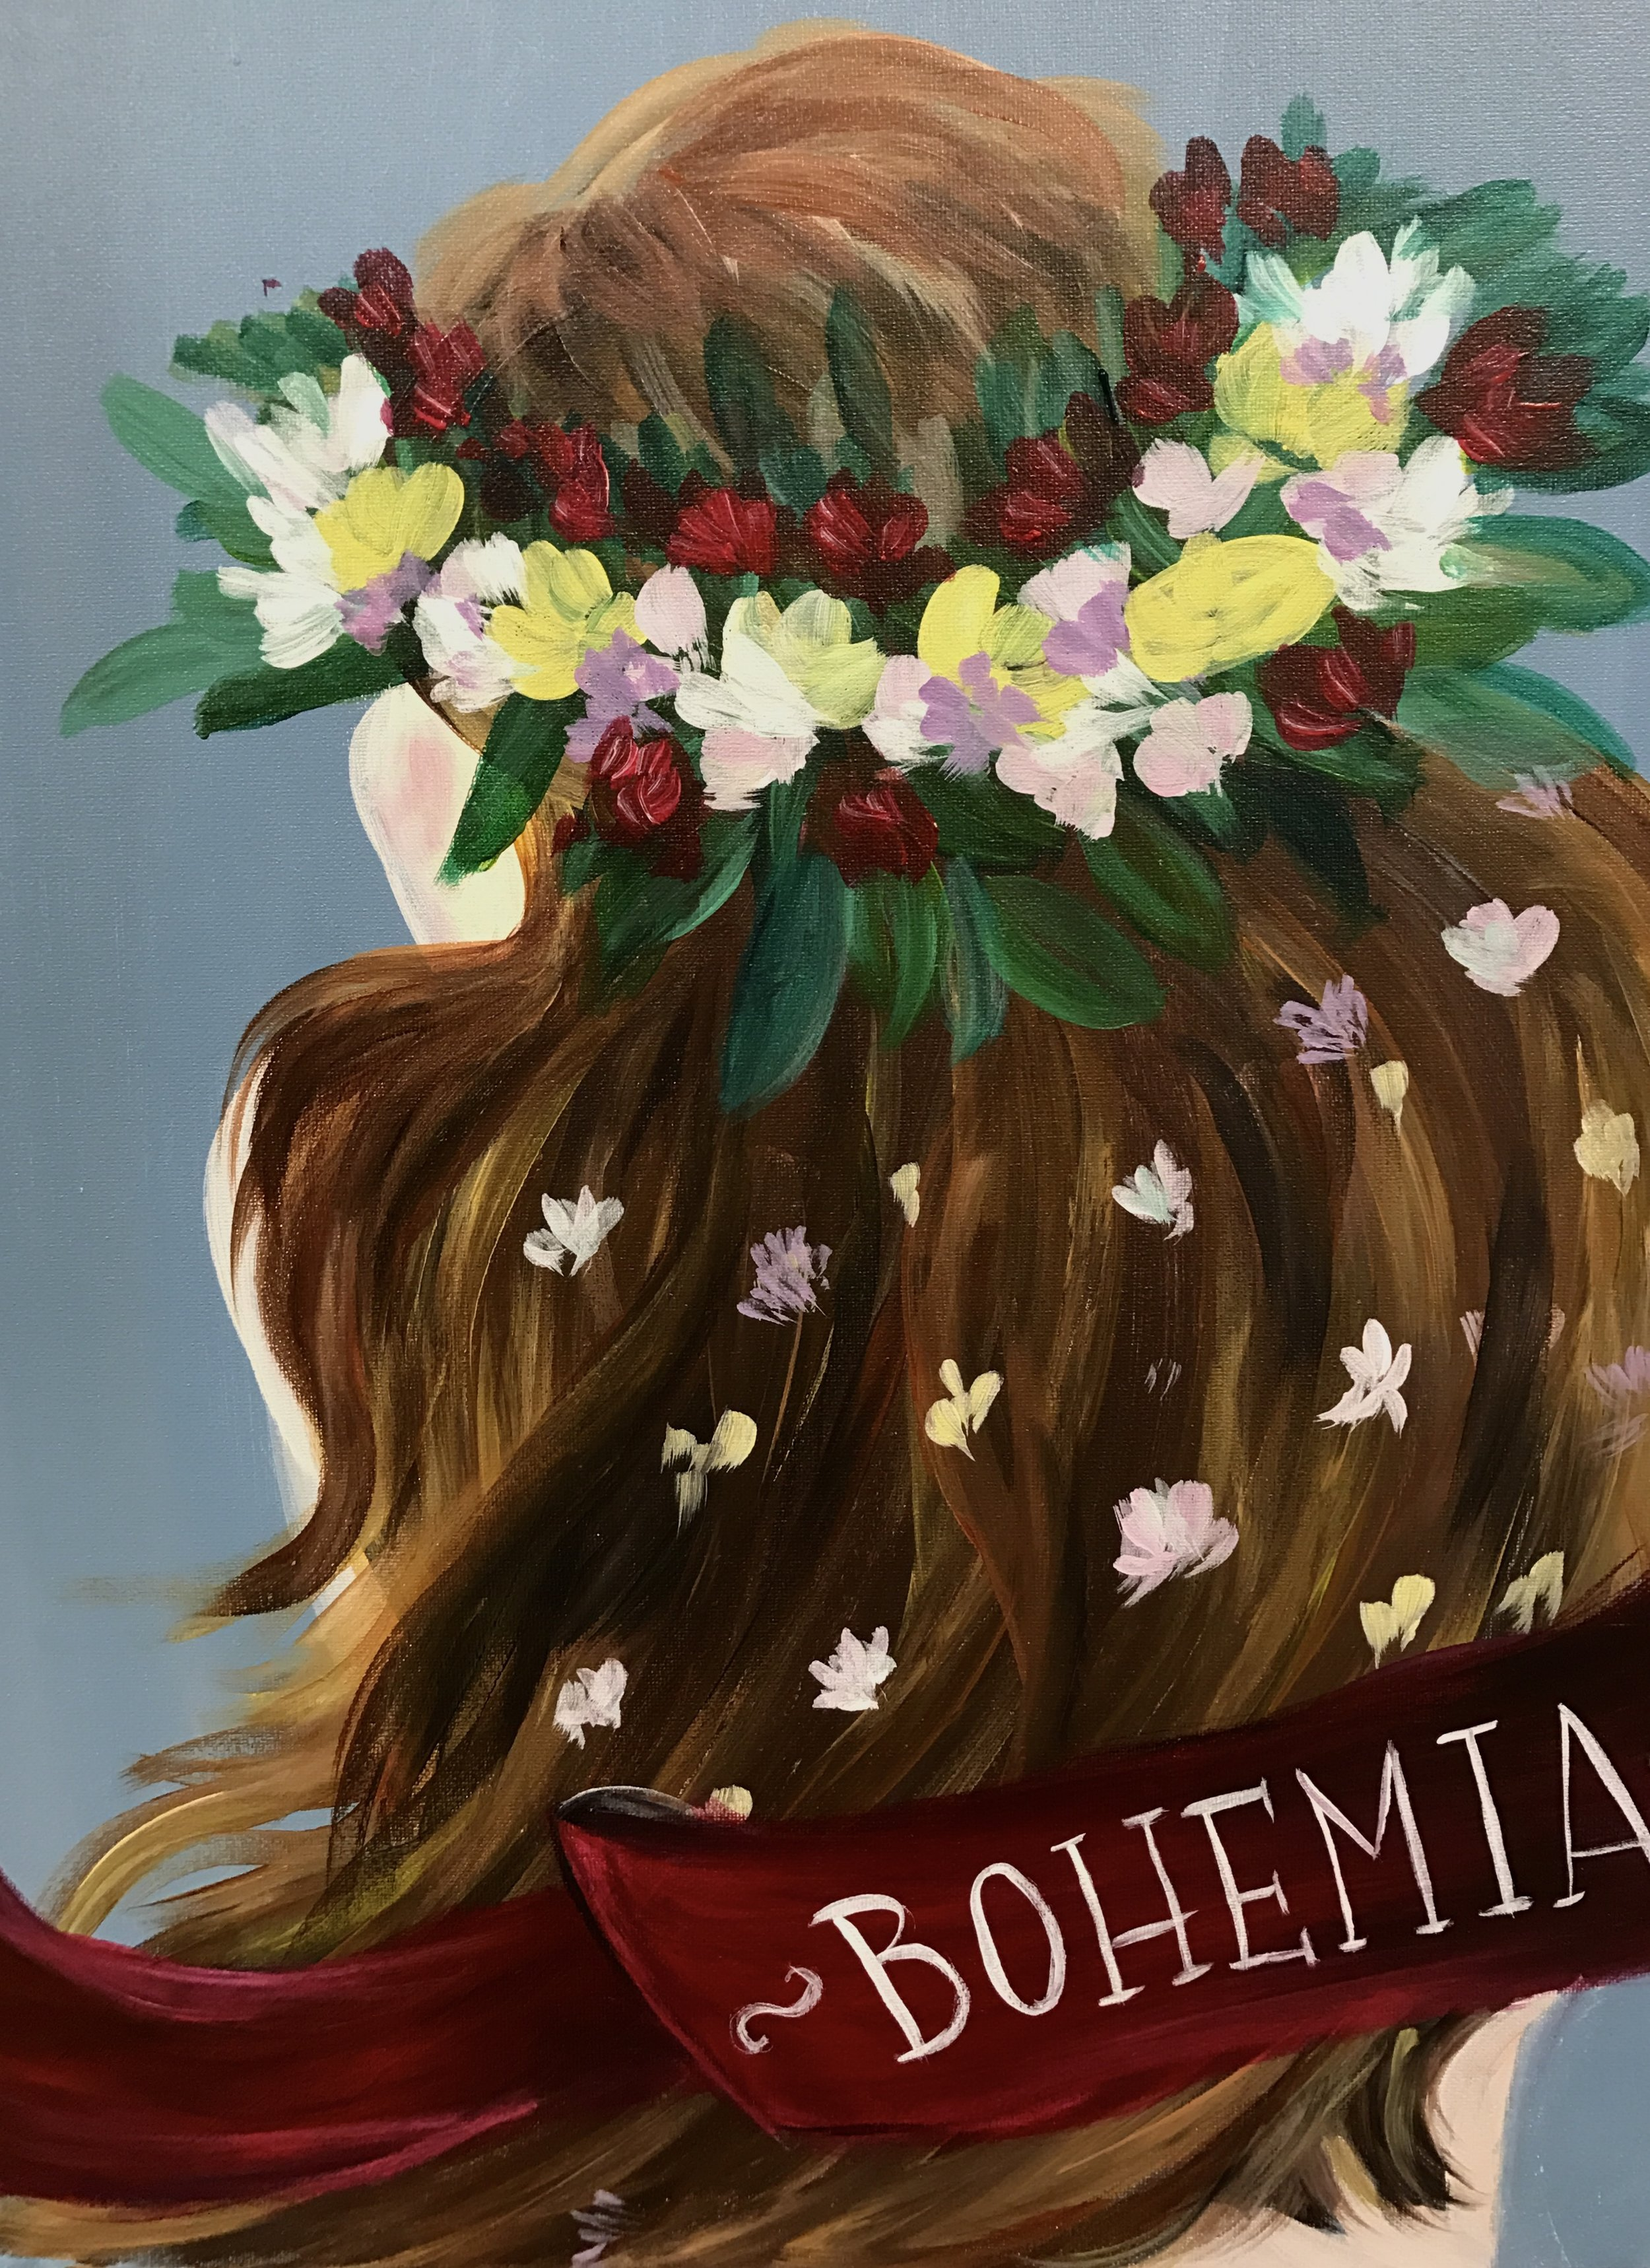 Bohemia.jpg